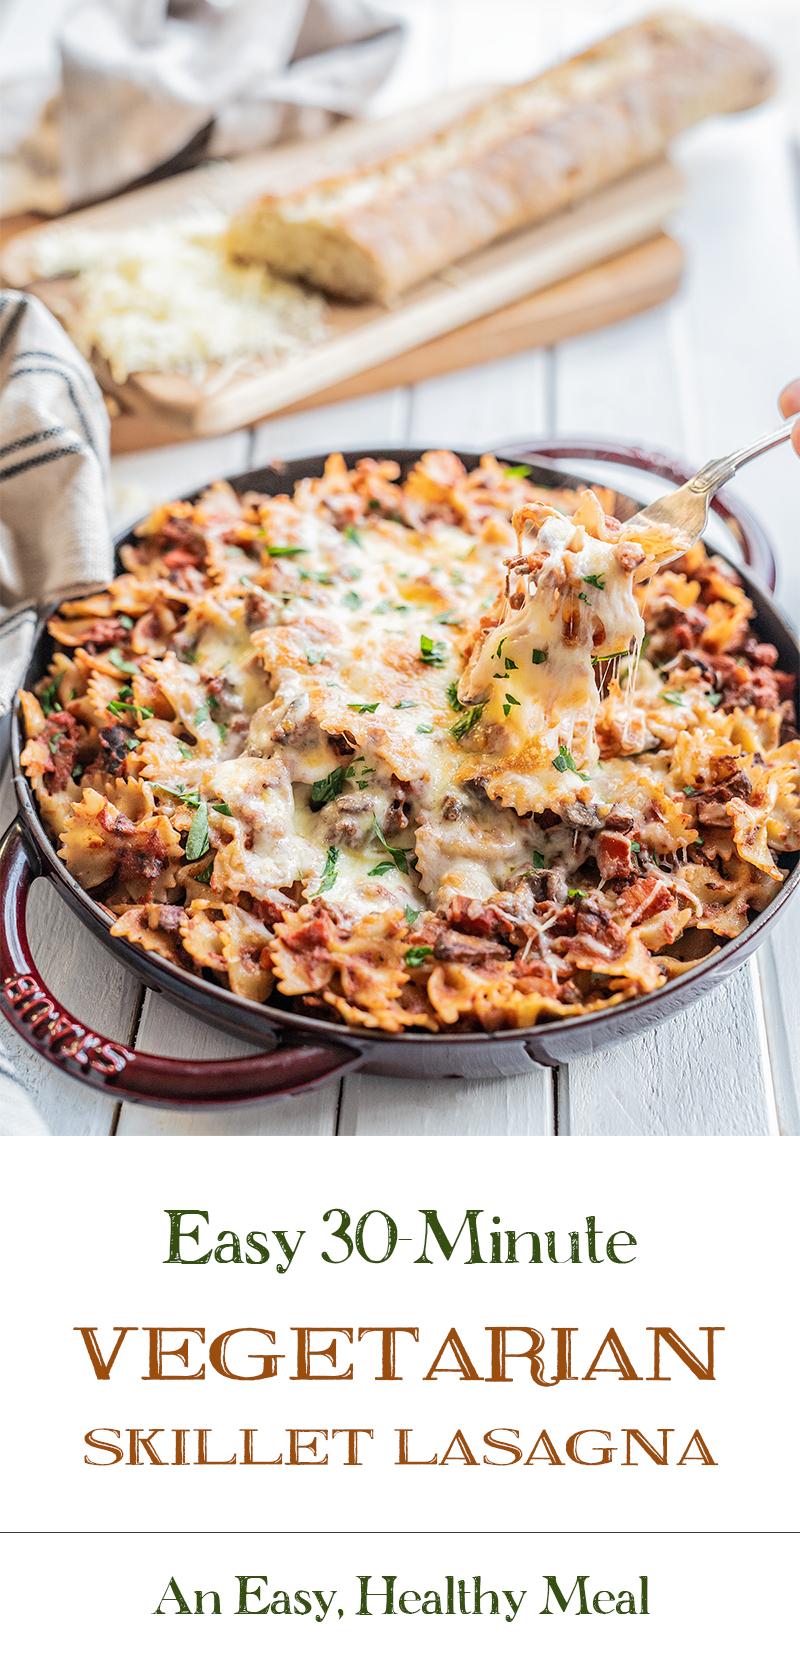 Easy-30-Minute-Vegetarian-Skillet-Lasagna